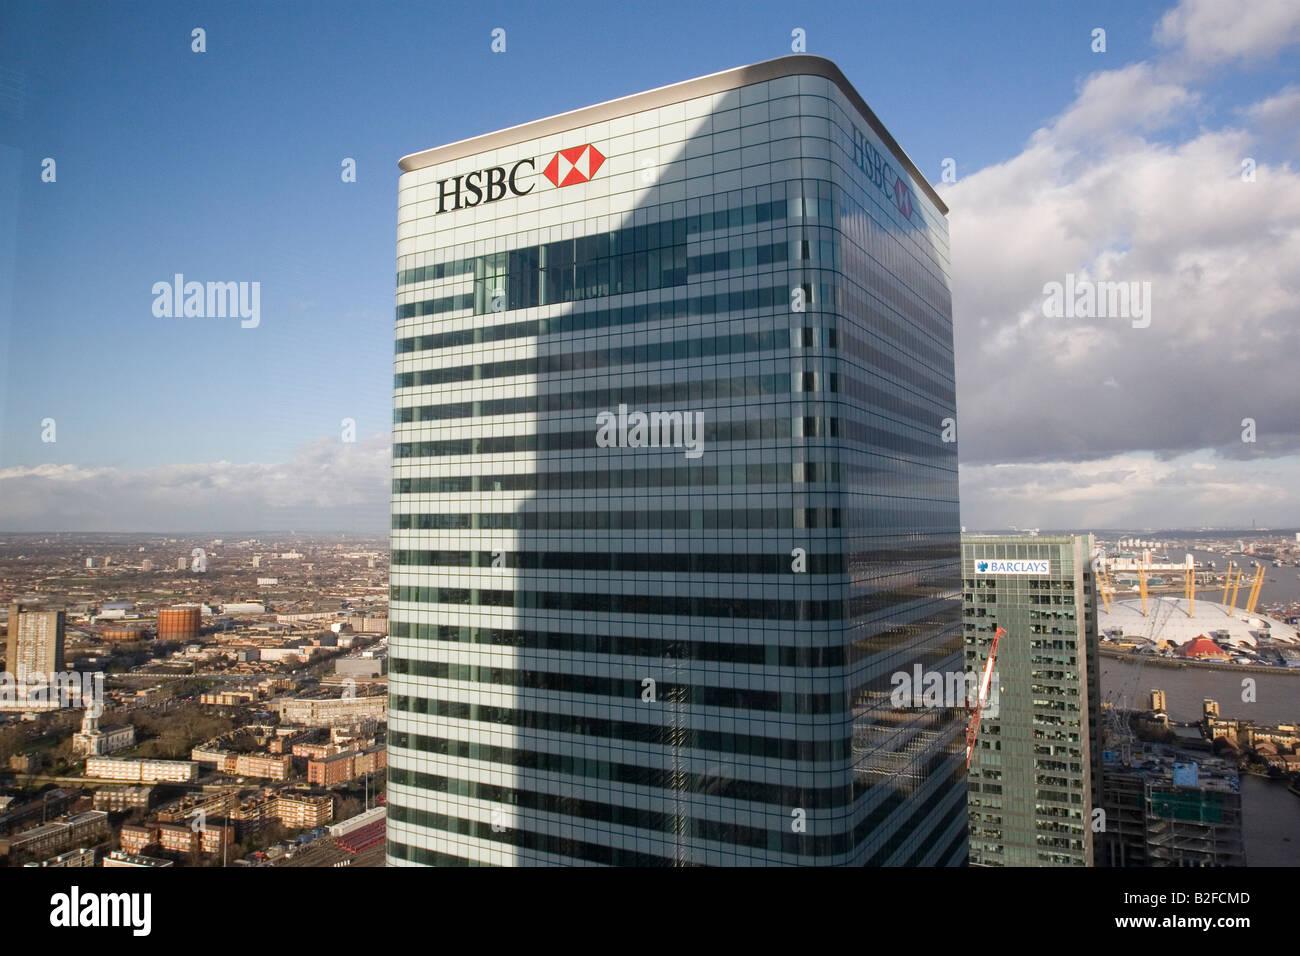 HSBC Headquarters London Stock Photo: 18778941 - Alamy